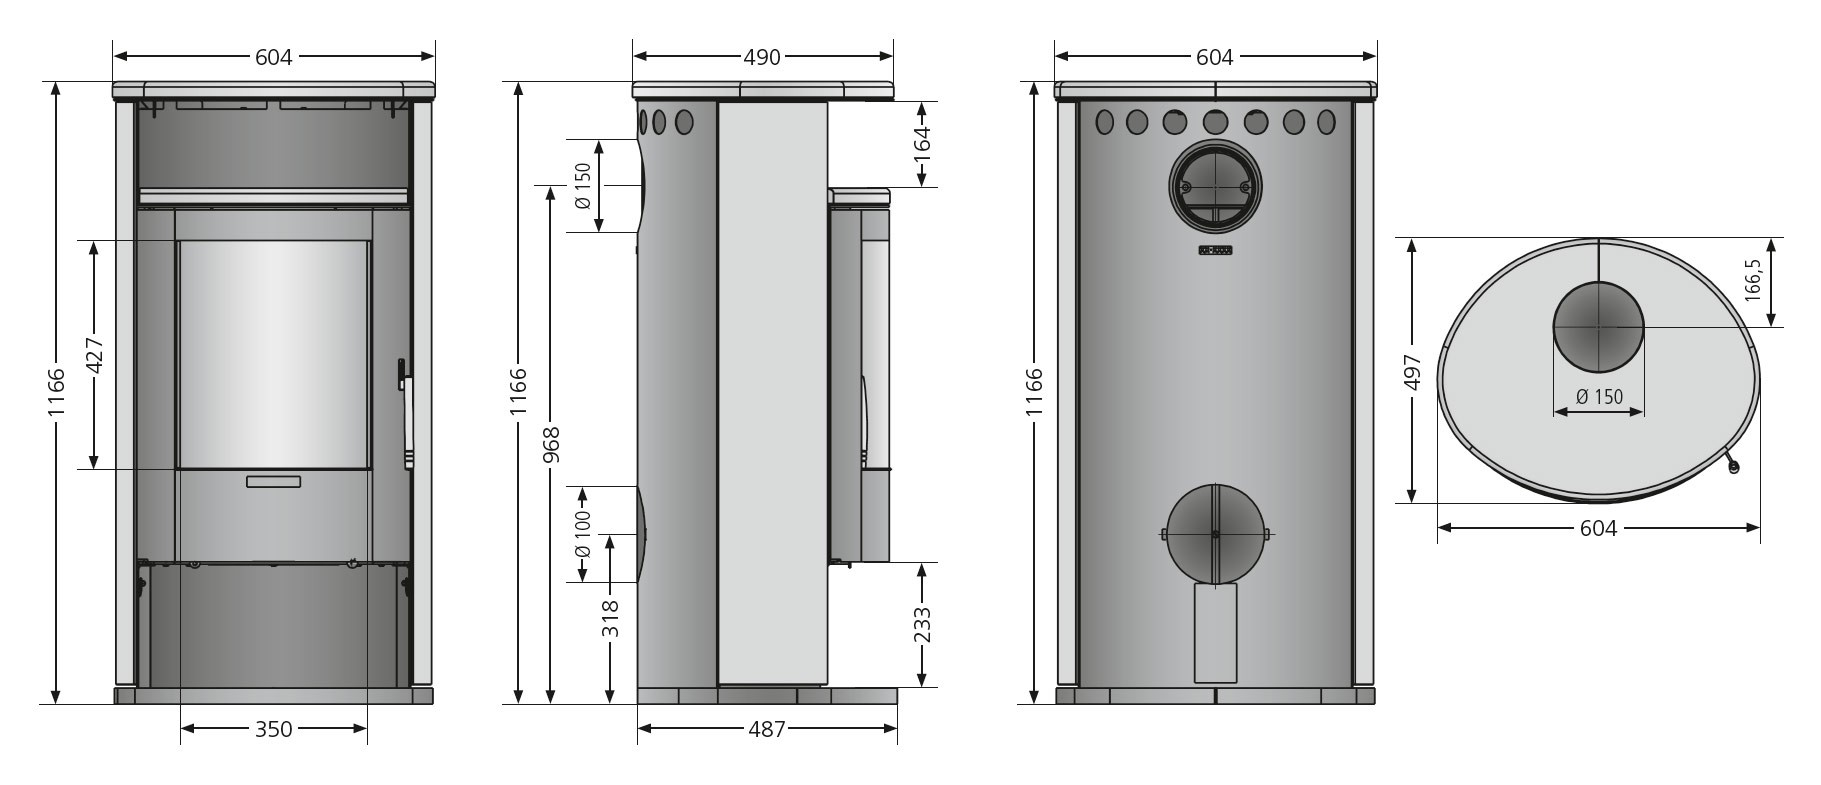 Kaminofen Justus Island 7 raumluftunabhängig Keramik Coretto 6,5kW Bild 2